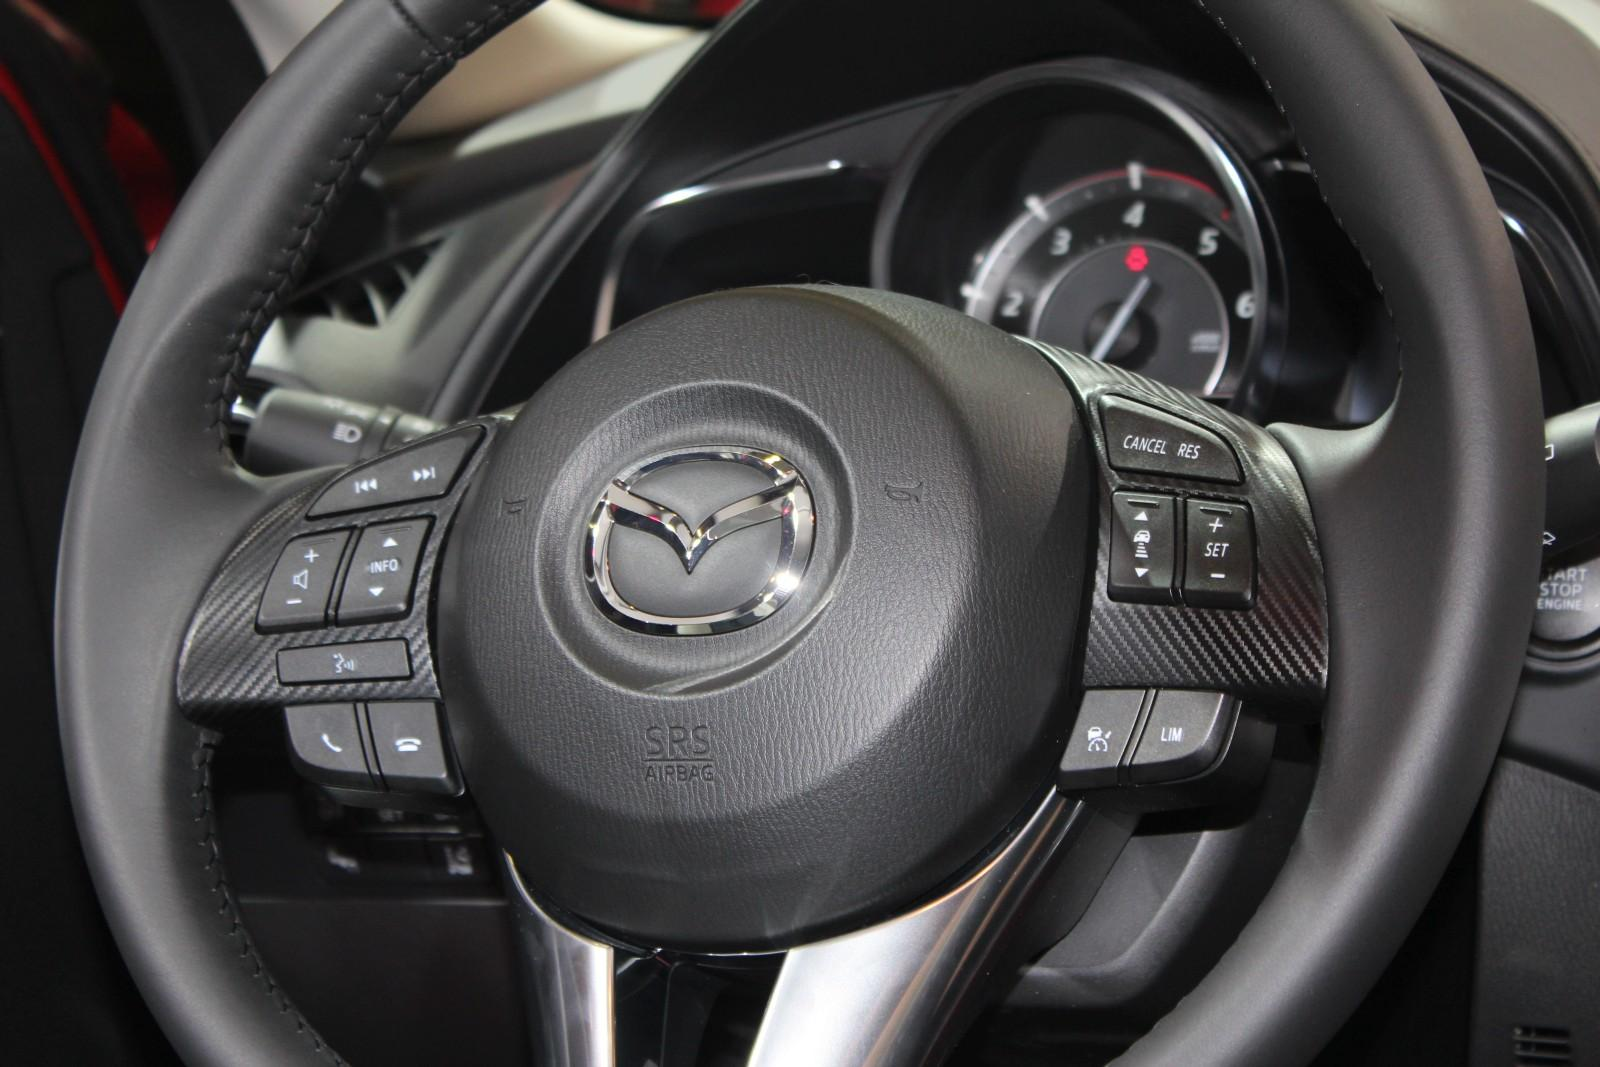 MazdaClubTR_IstanbulAutoshow2015-041.jpg